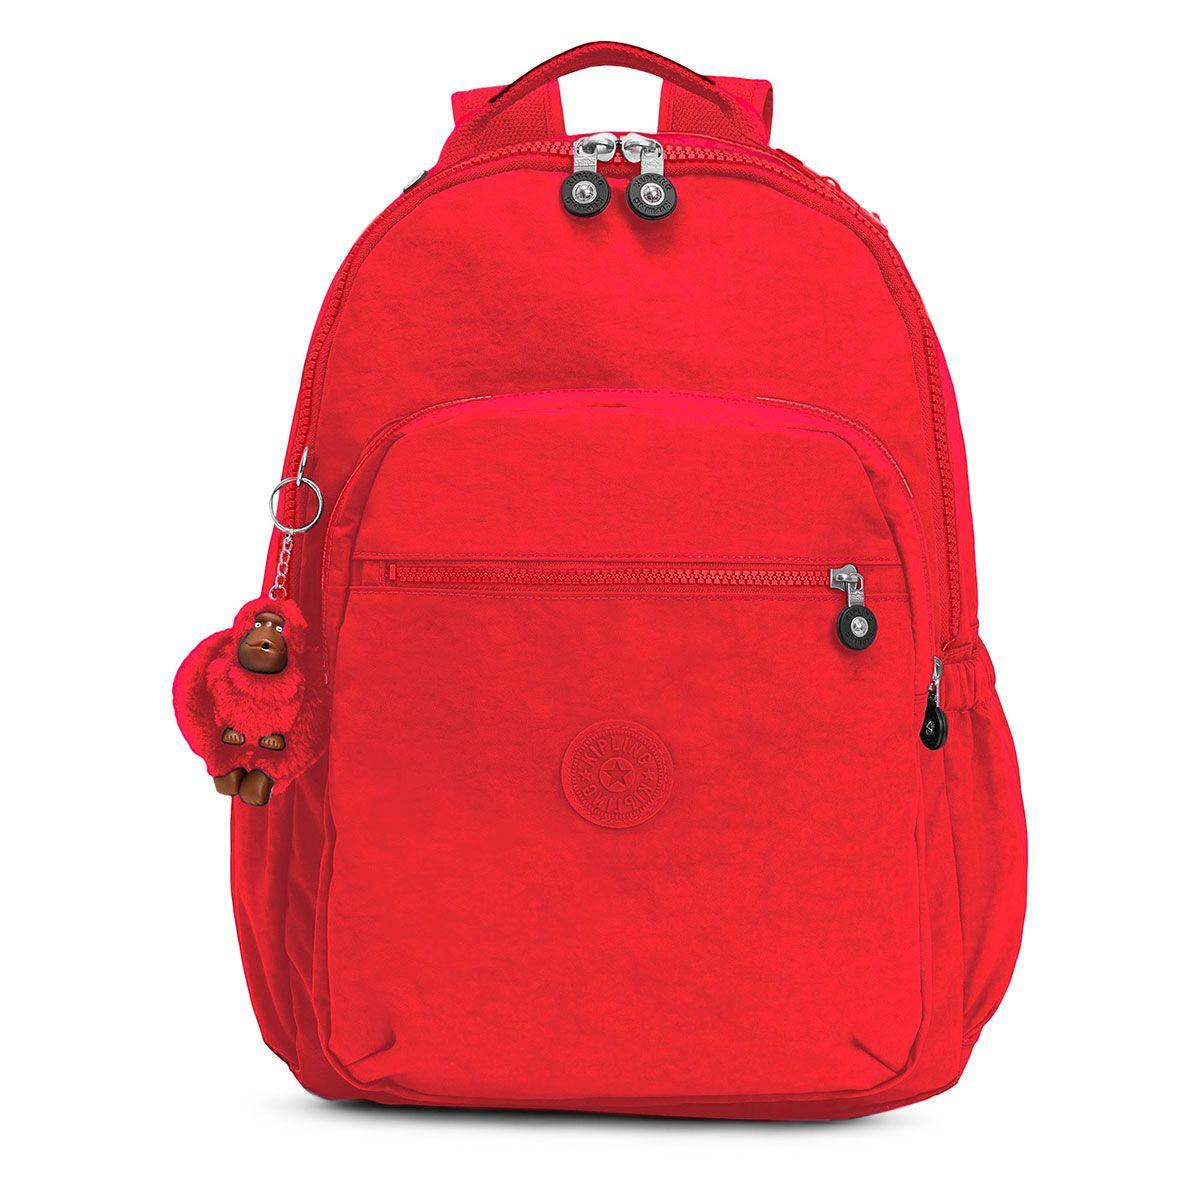 3d8882dbf47d2 Shop Kipling Backpacks - Macy s